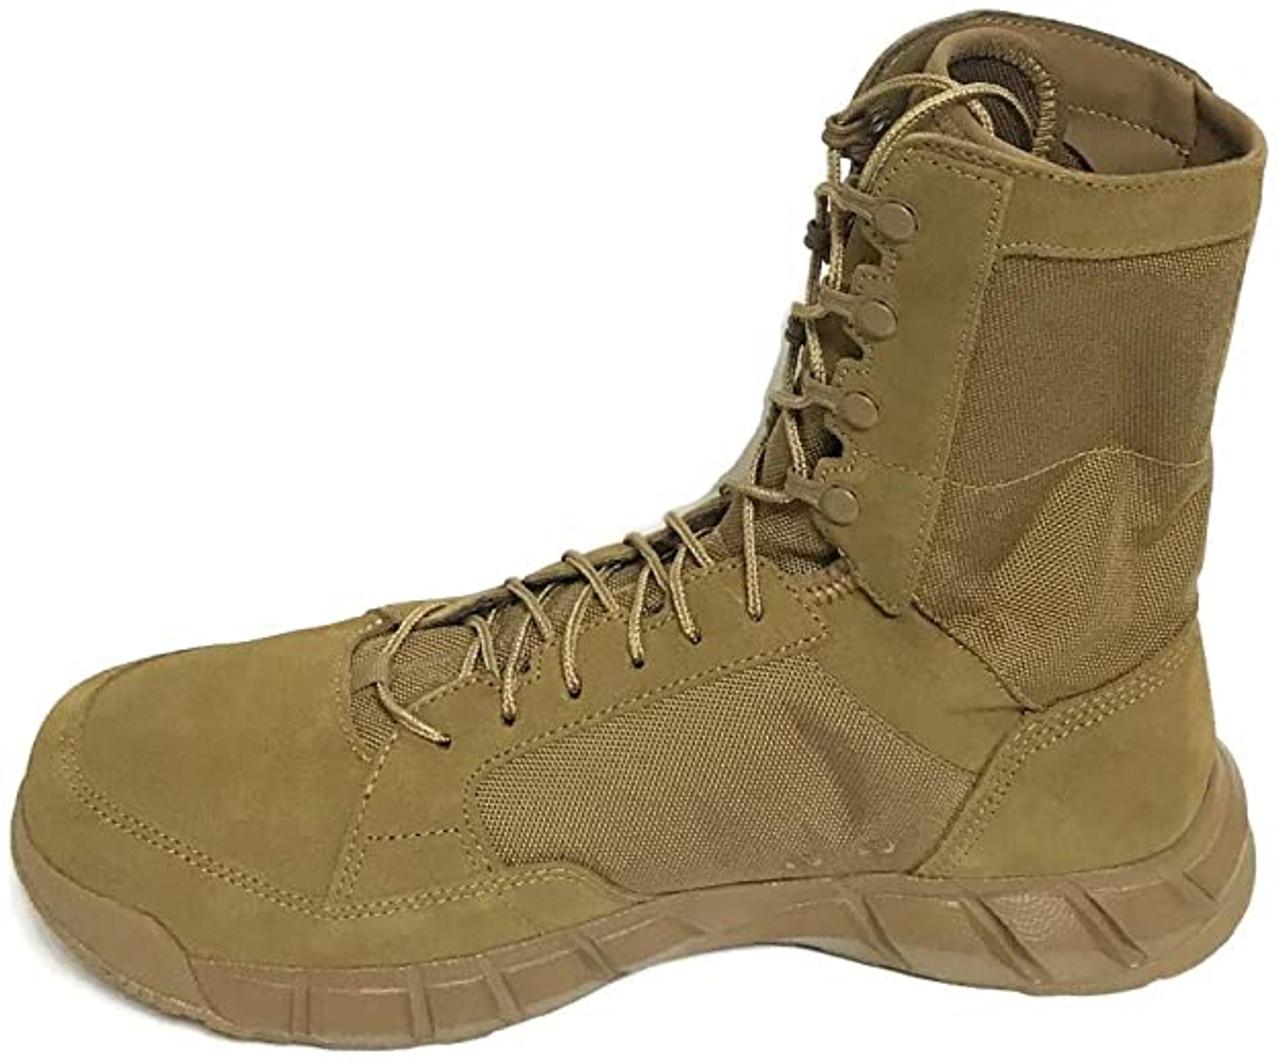 Oakley Men's Light Assault 2 Boots Coyote Size 11.5